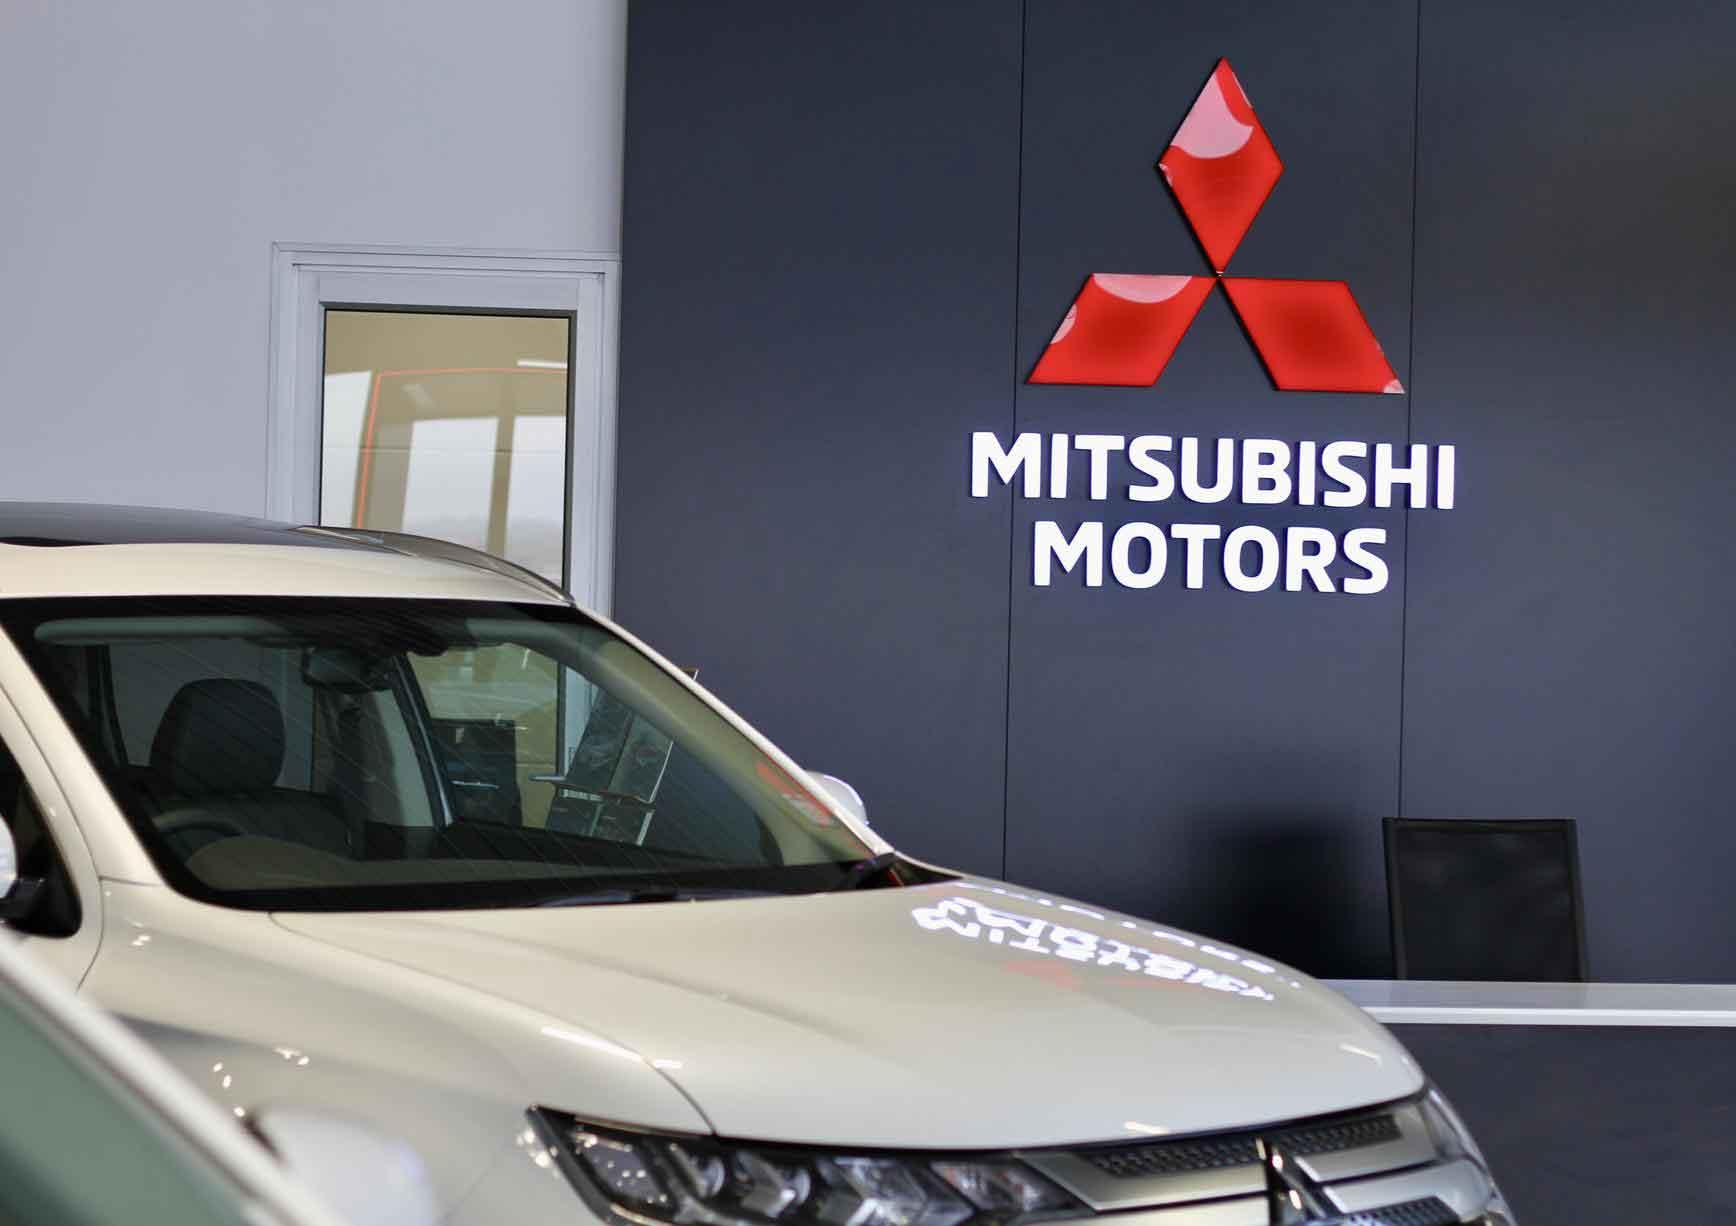 Motus Mitsubishi Zambezi dealer image0